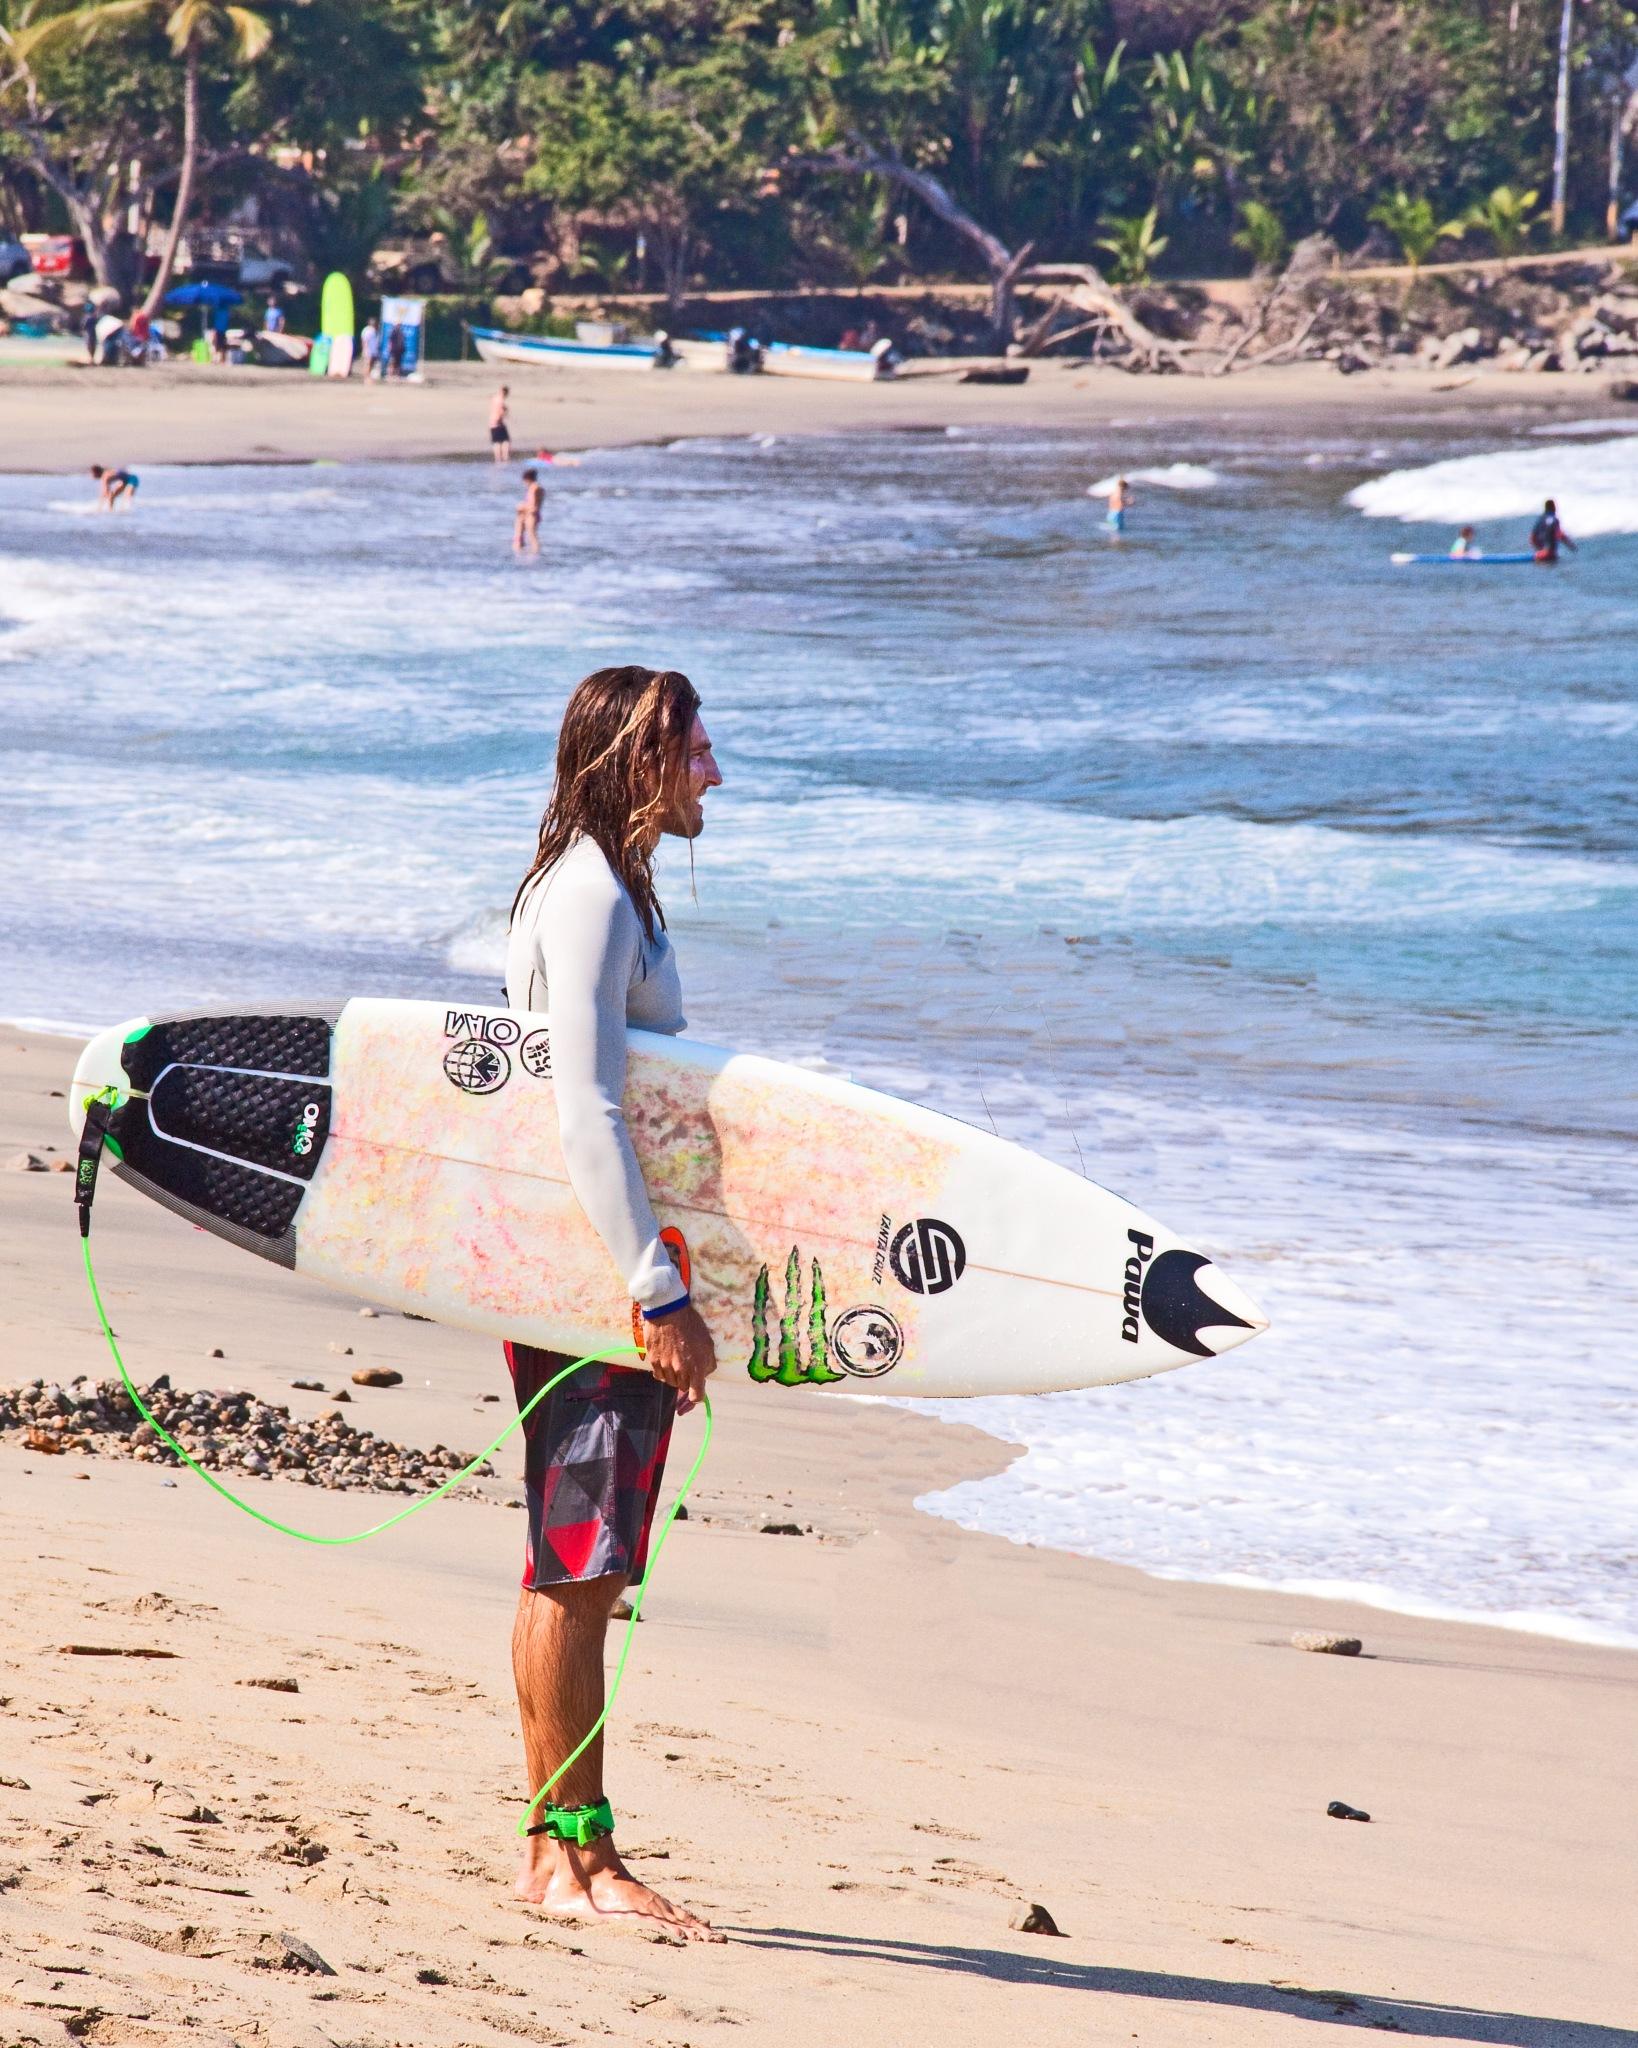 Checking the Surf by Bobjb